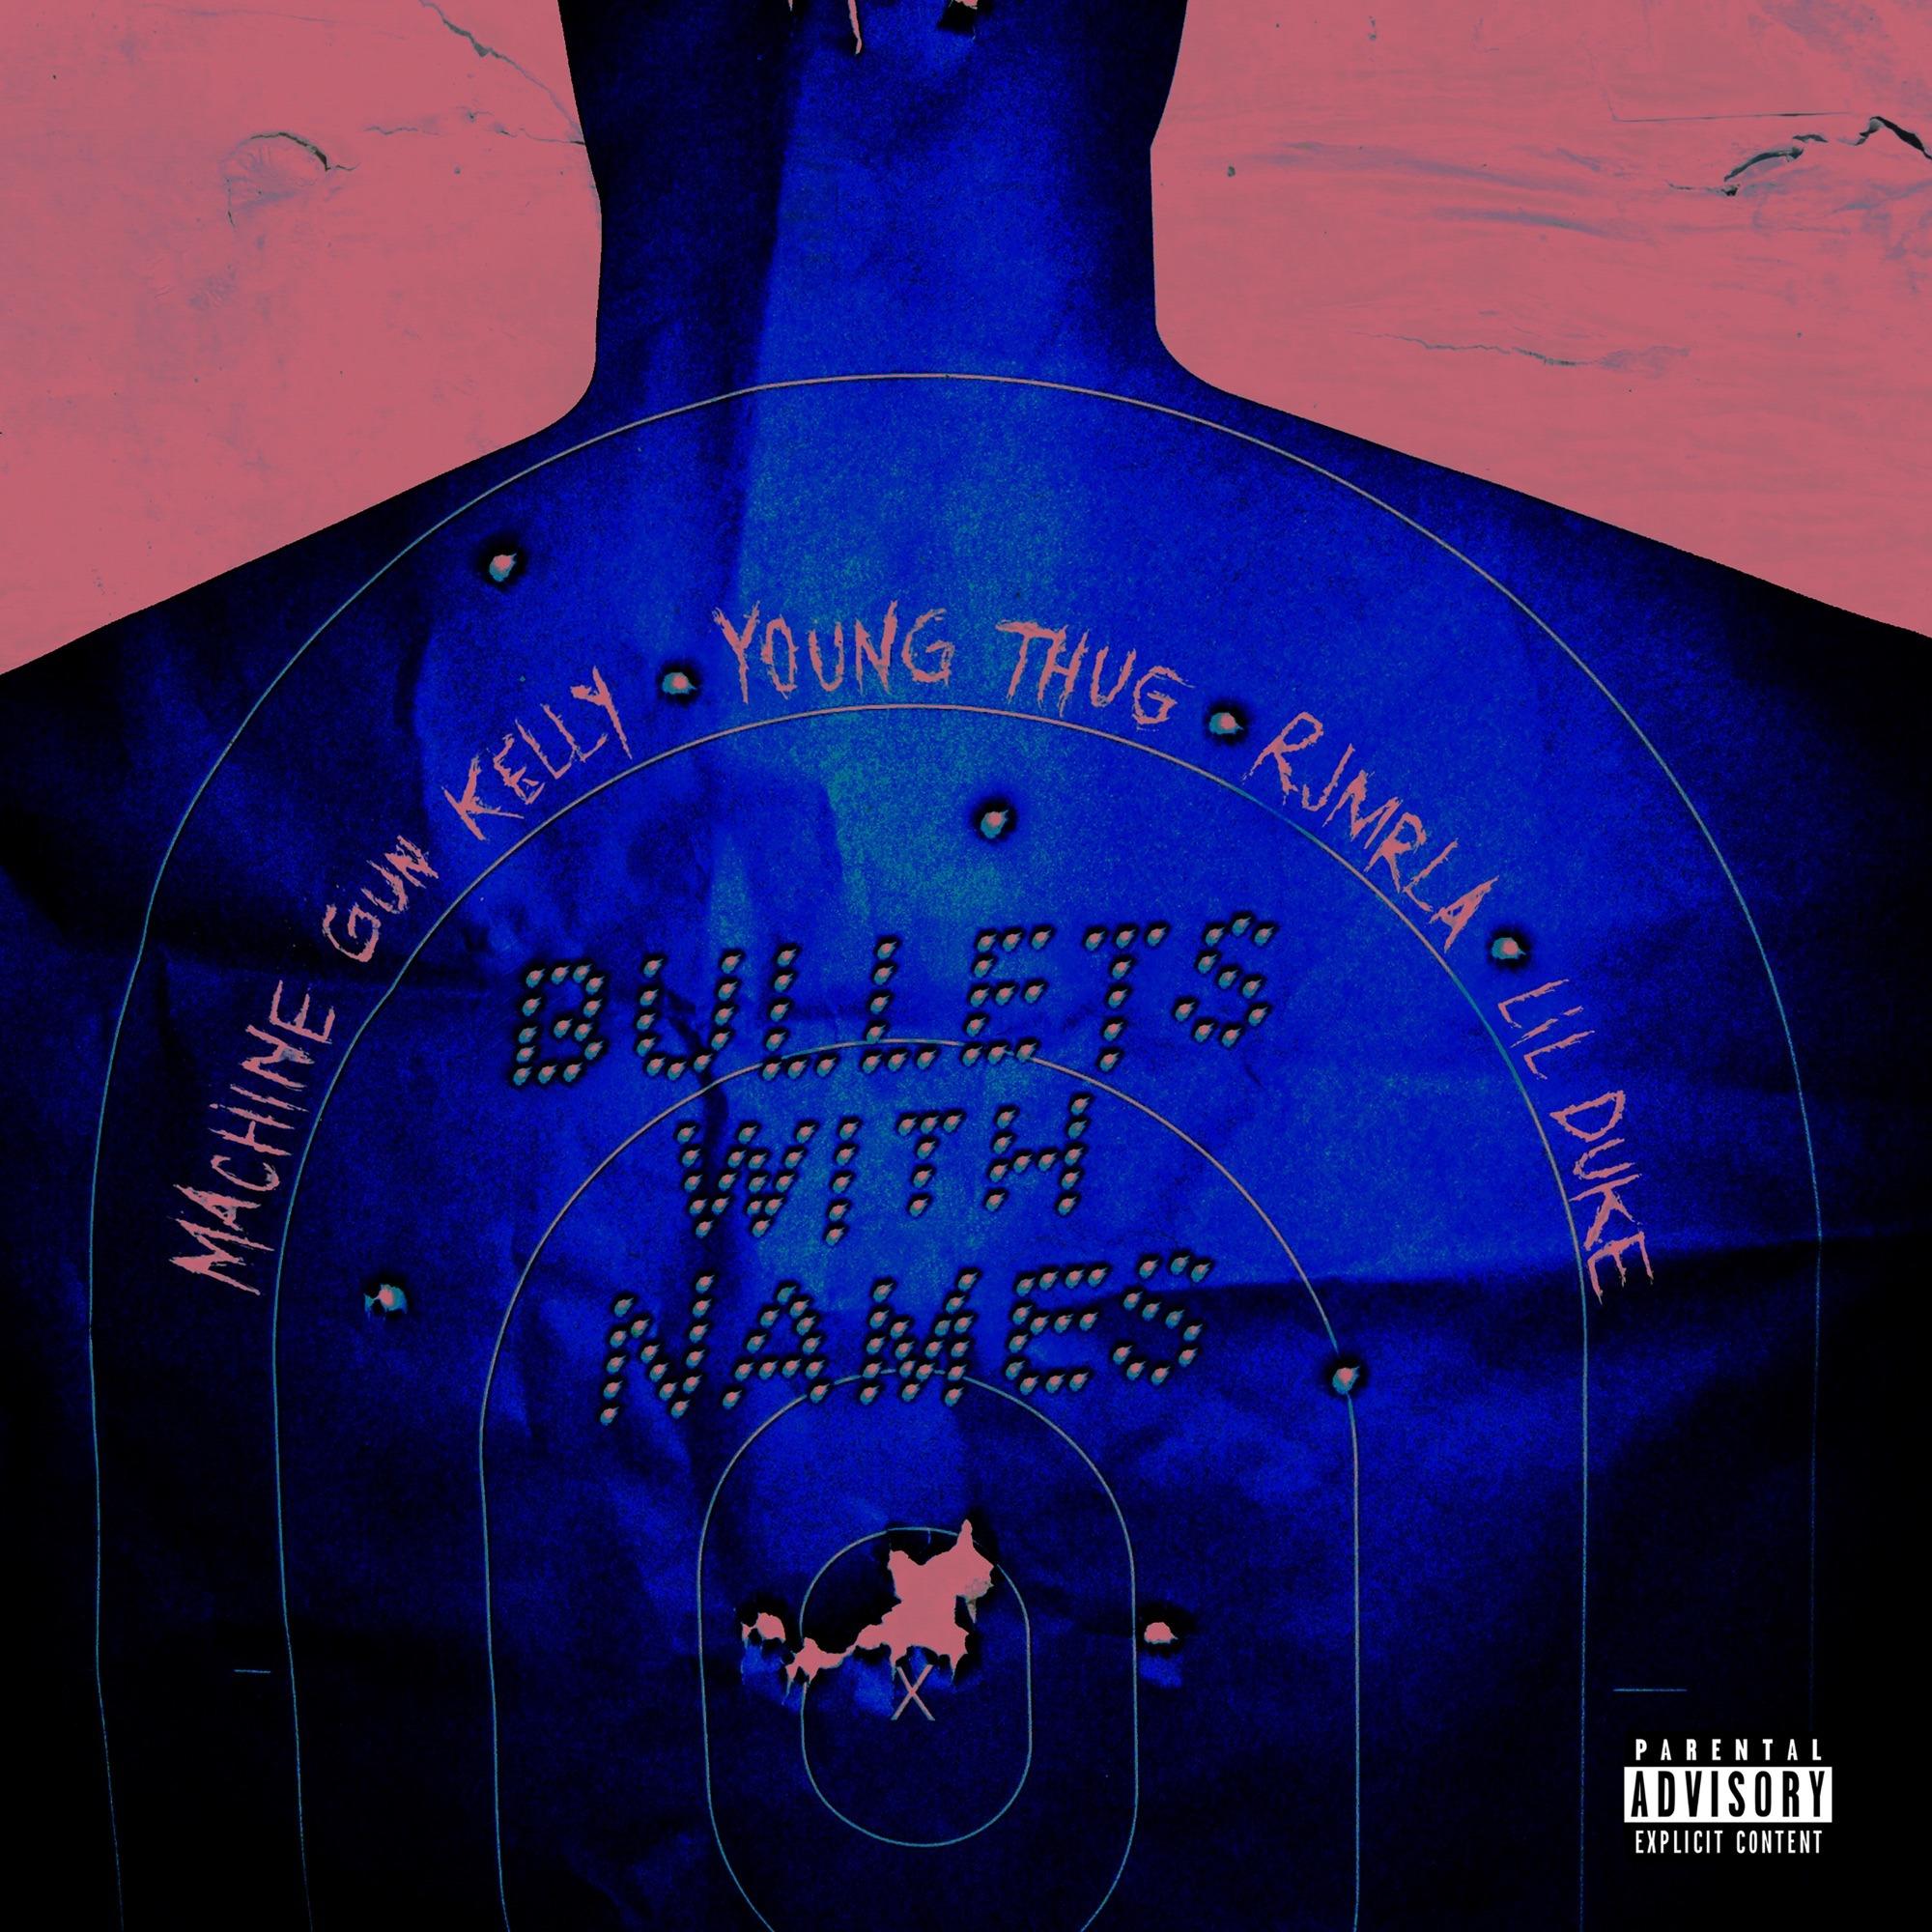 New Single: Machine Gun Kelly - Bullets With Names (feat. Young Thug, RJmrLA & Lil Duke)